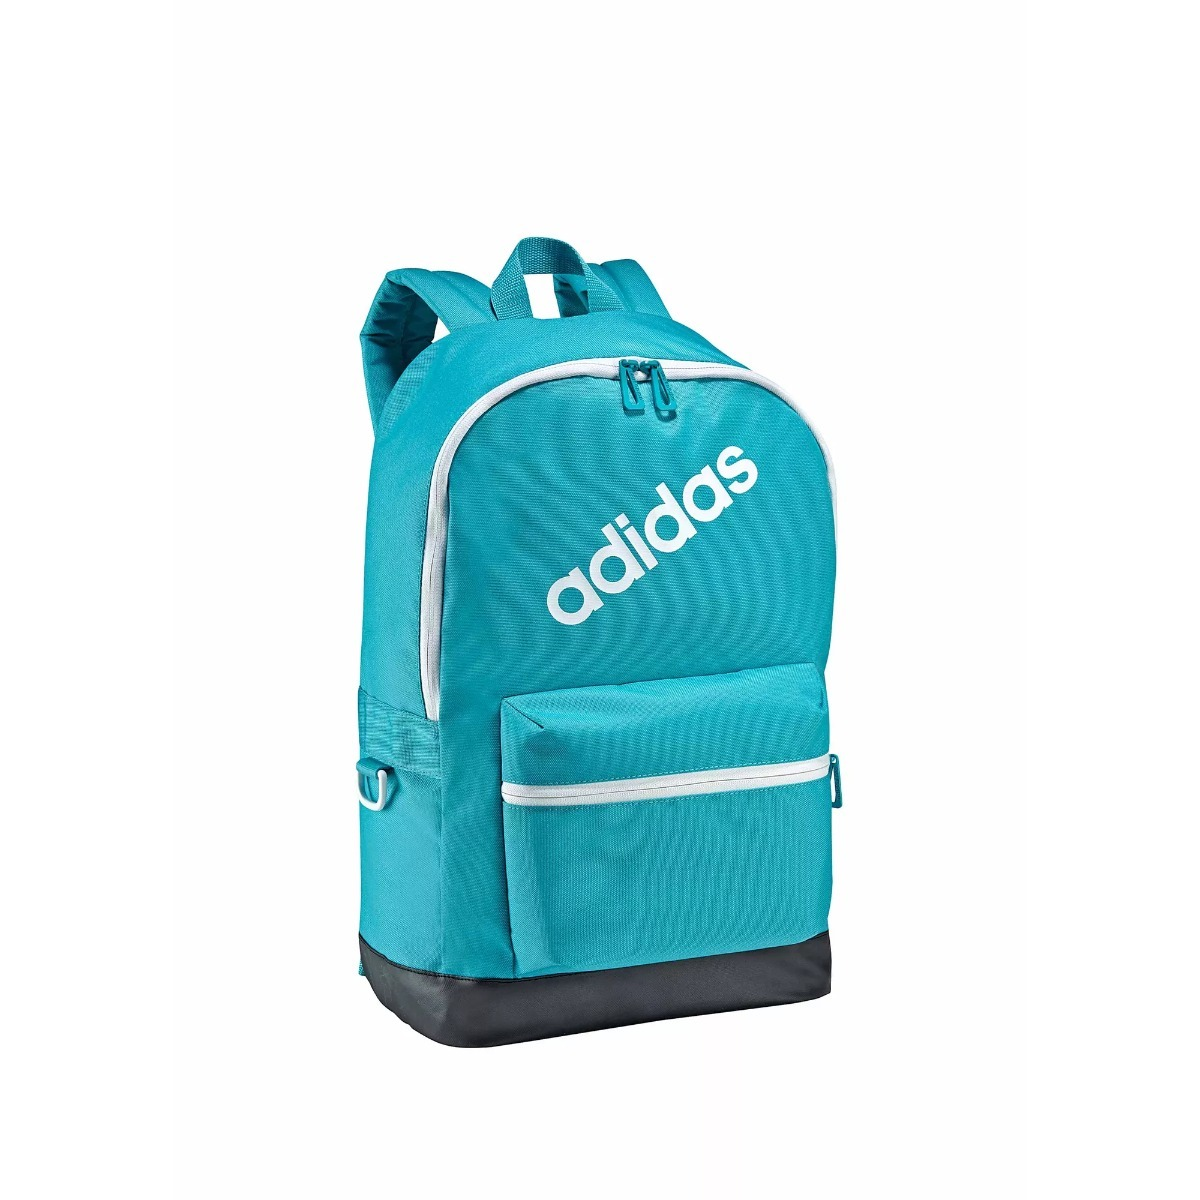 Bp Azul Daily Gratis Claro Envío Adidas Mochila Backpack gf76Yyvb